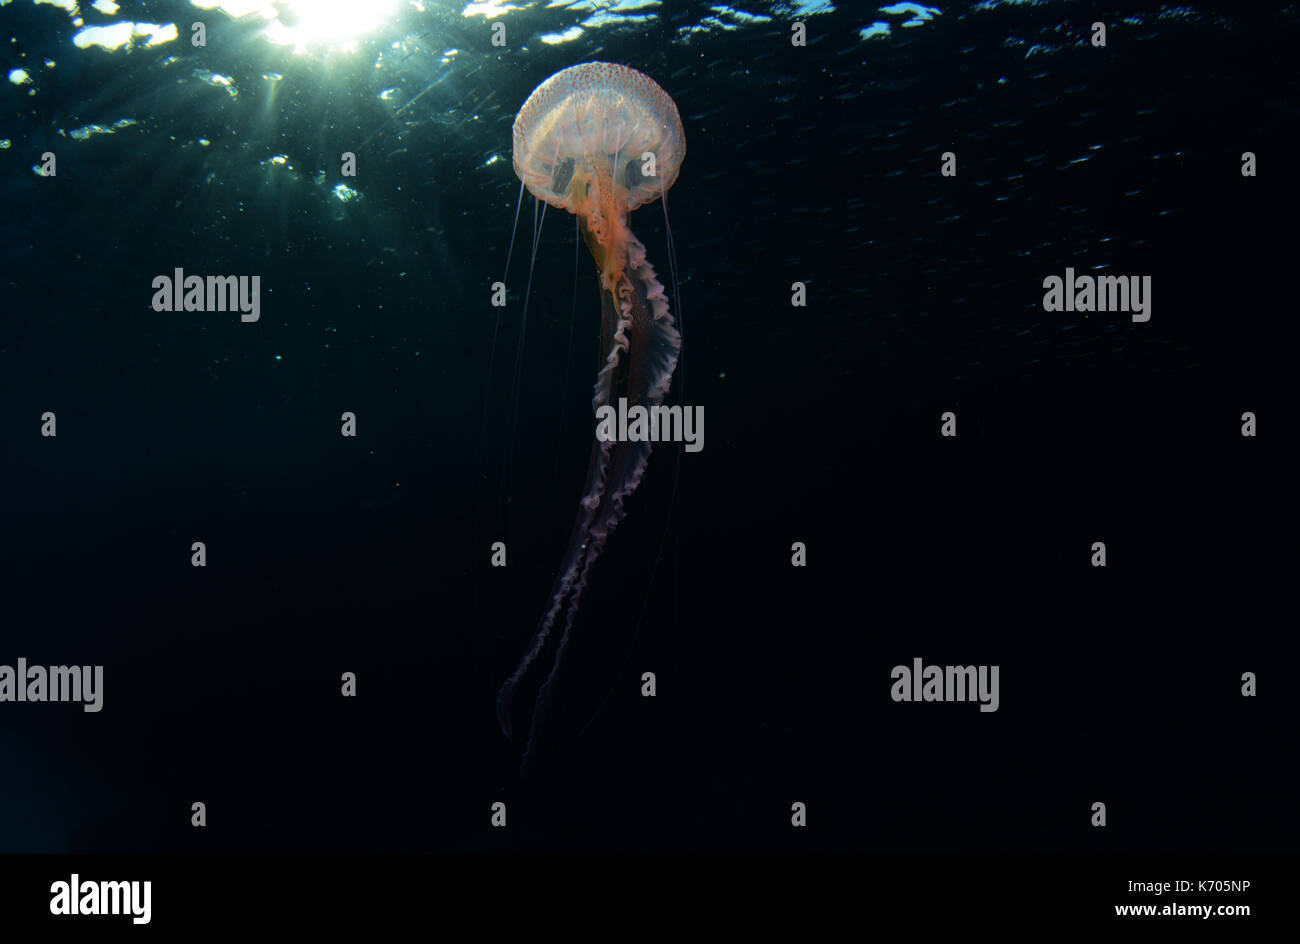 Mauve stinger jellyfish underwater at Cala Balanca, Menorca - Stock Image